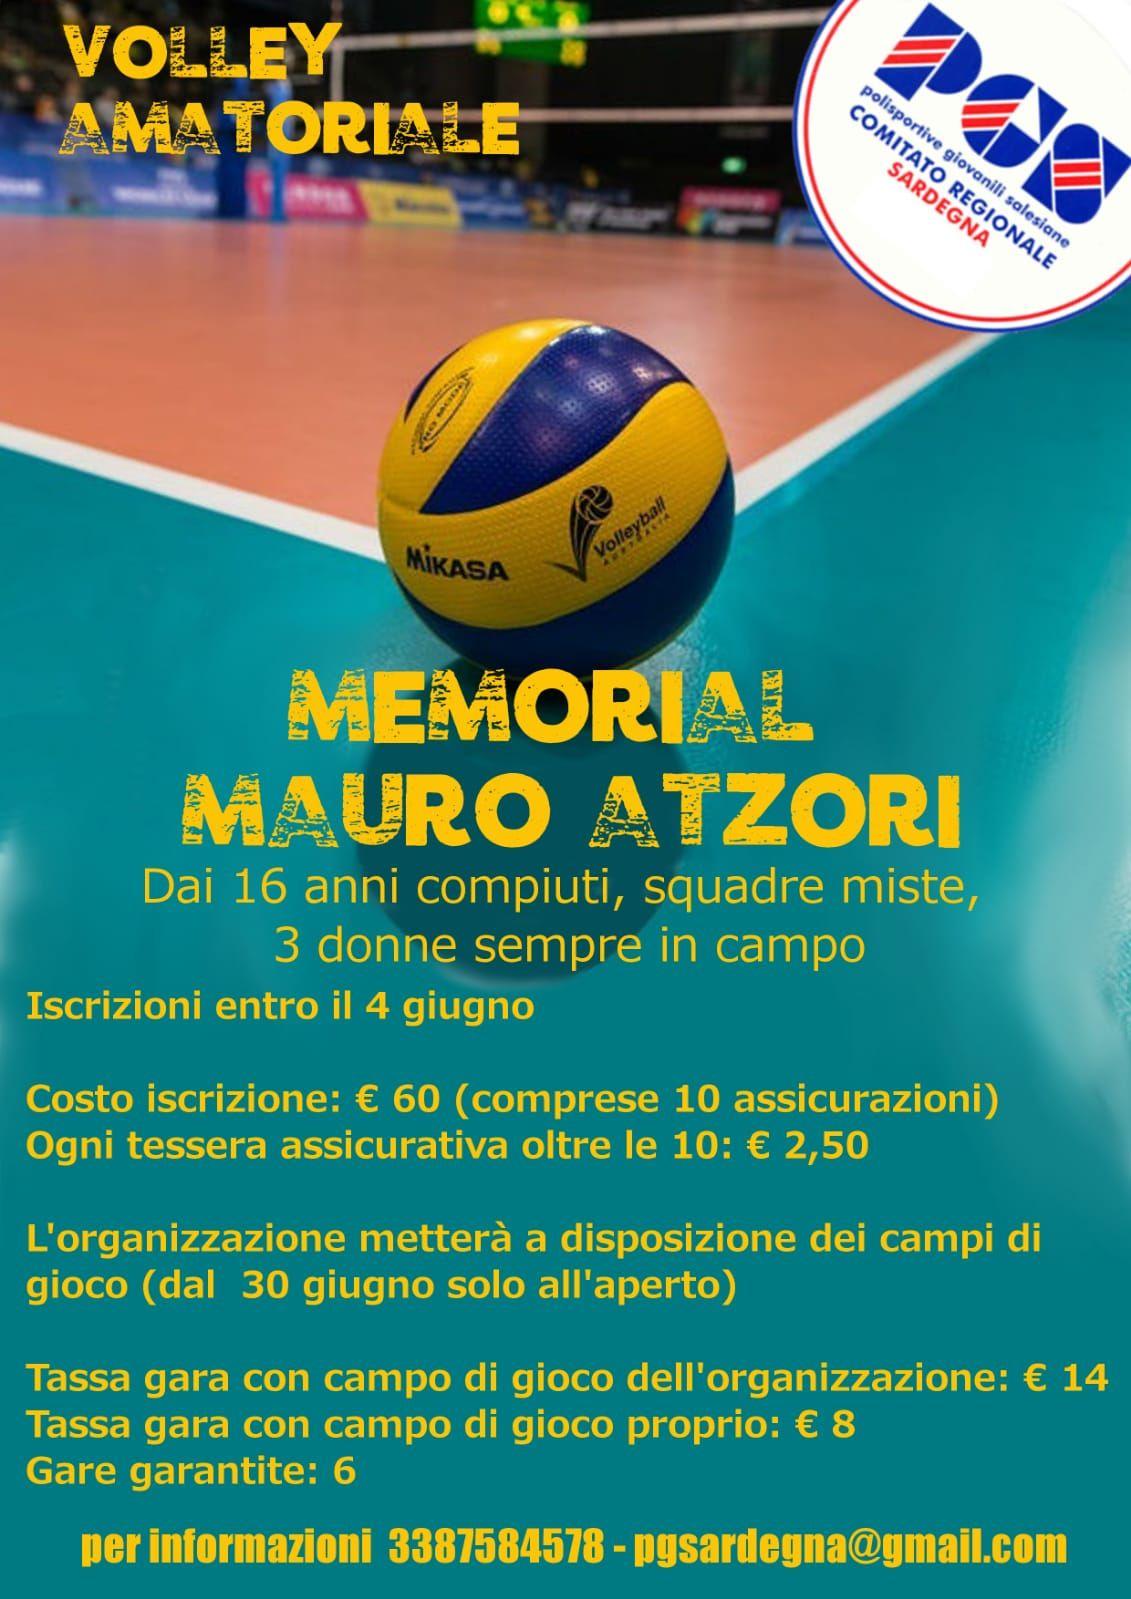 (Italiano) MEMORIAL MAURO ATZORI